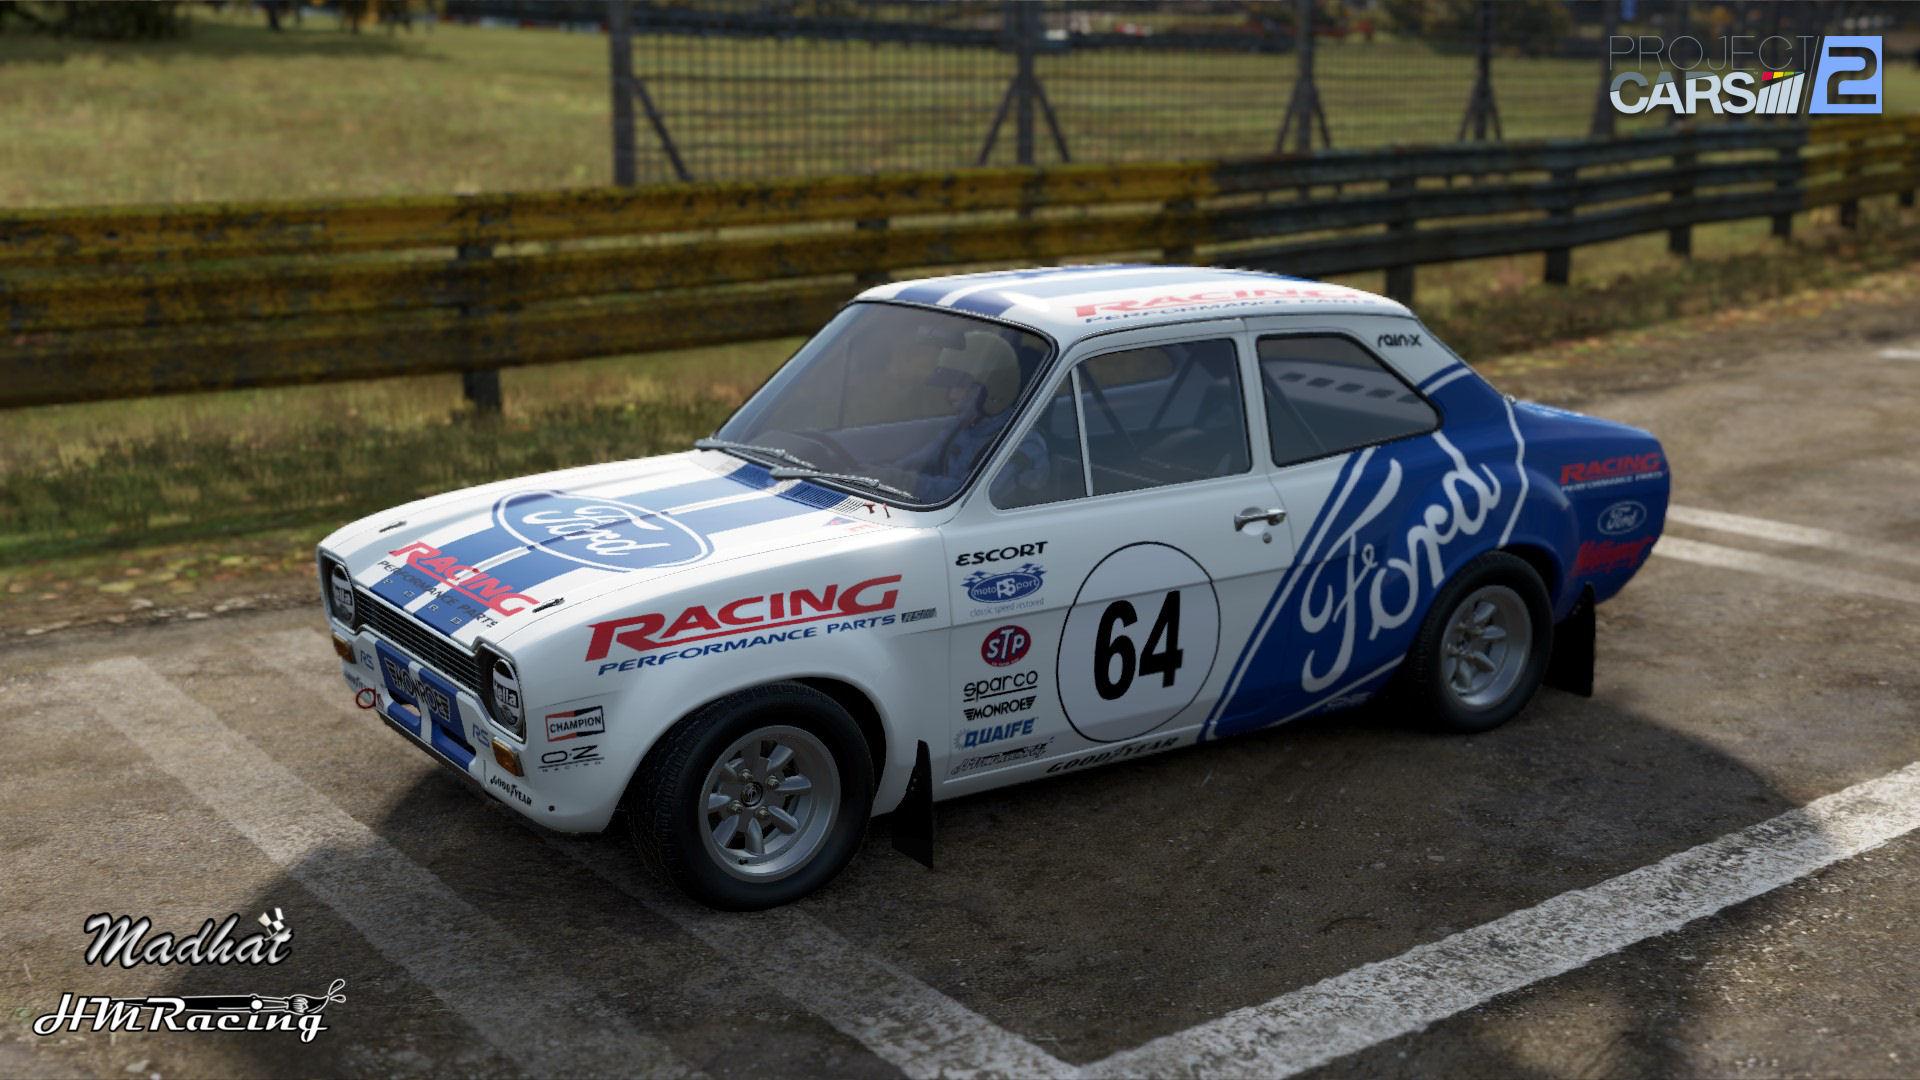 Ford Escort mk1 rx Racing Performance Parts 04.jpg